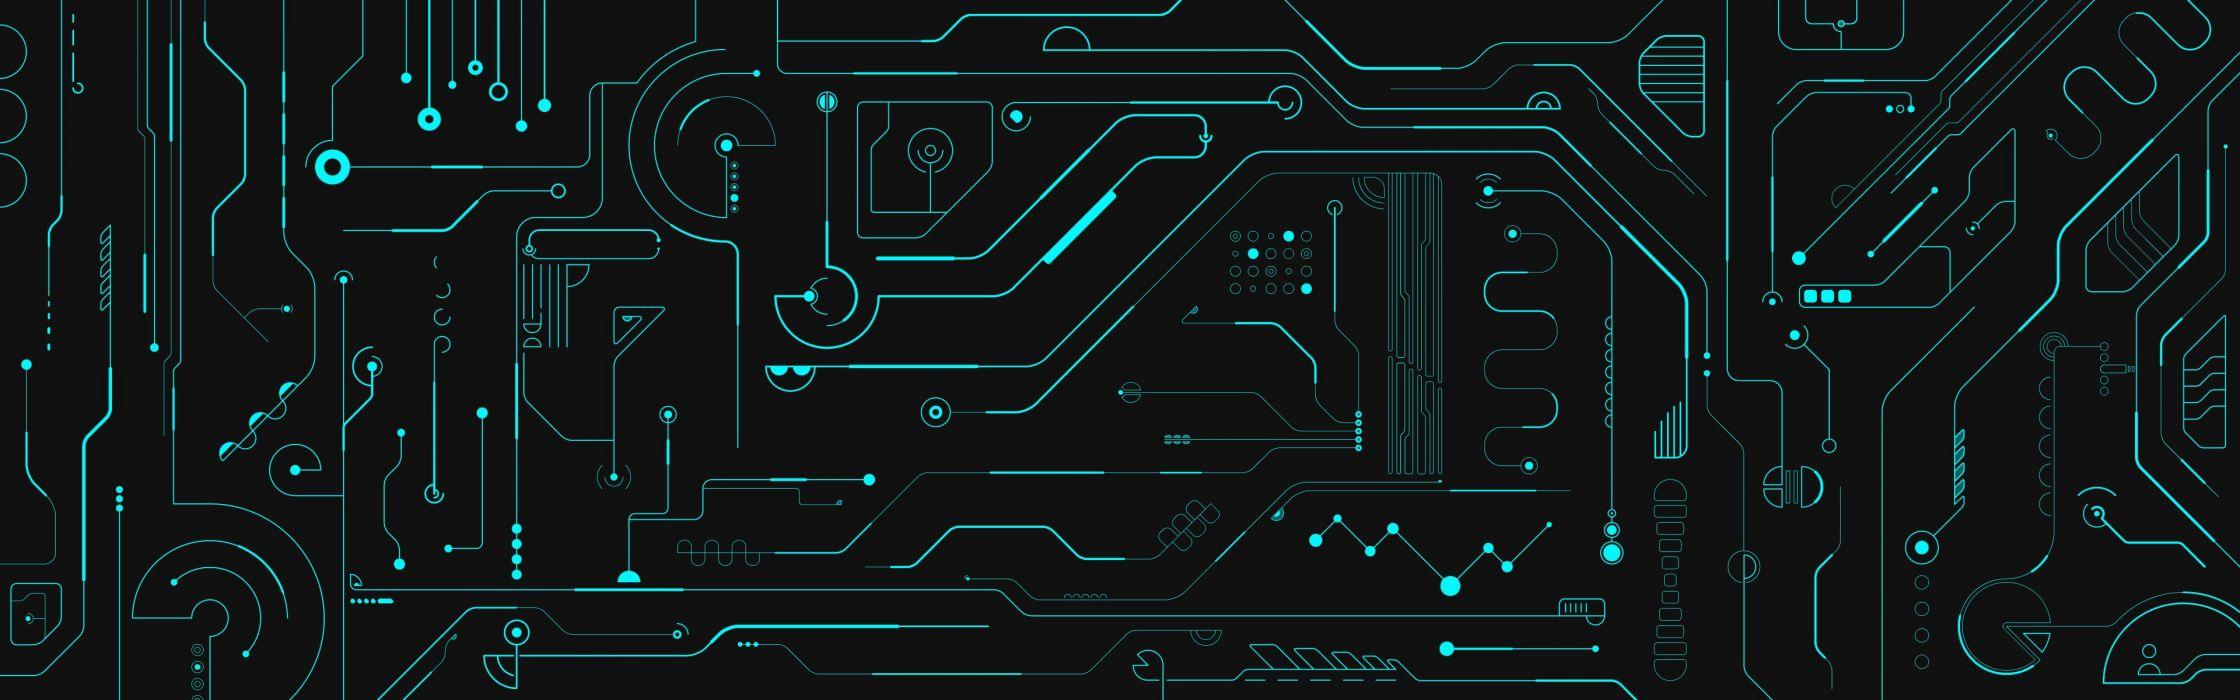 Circuit wallpaper | 3840x1200 | 23063 | WallpaperUP